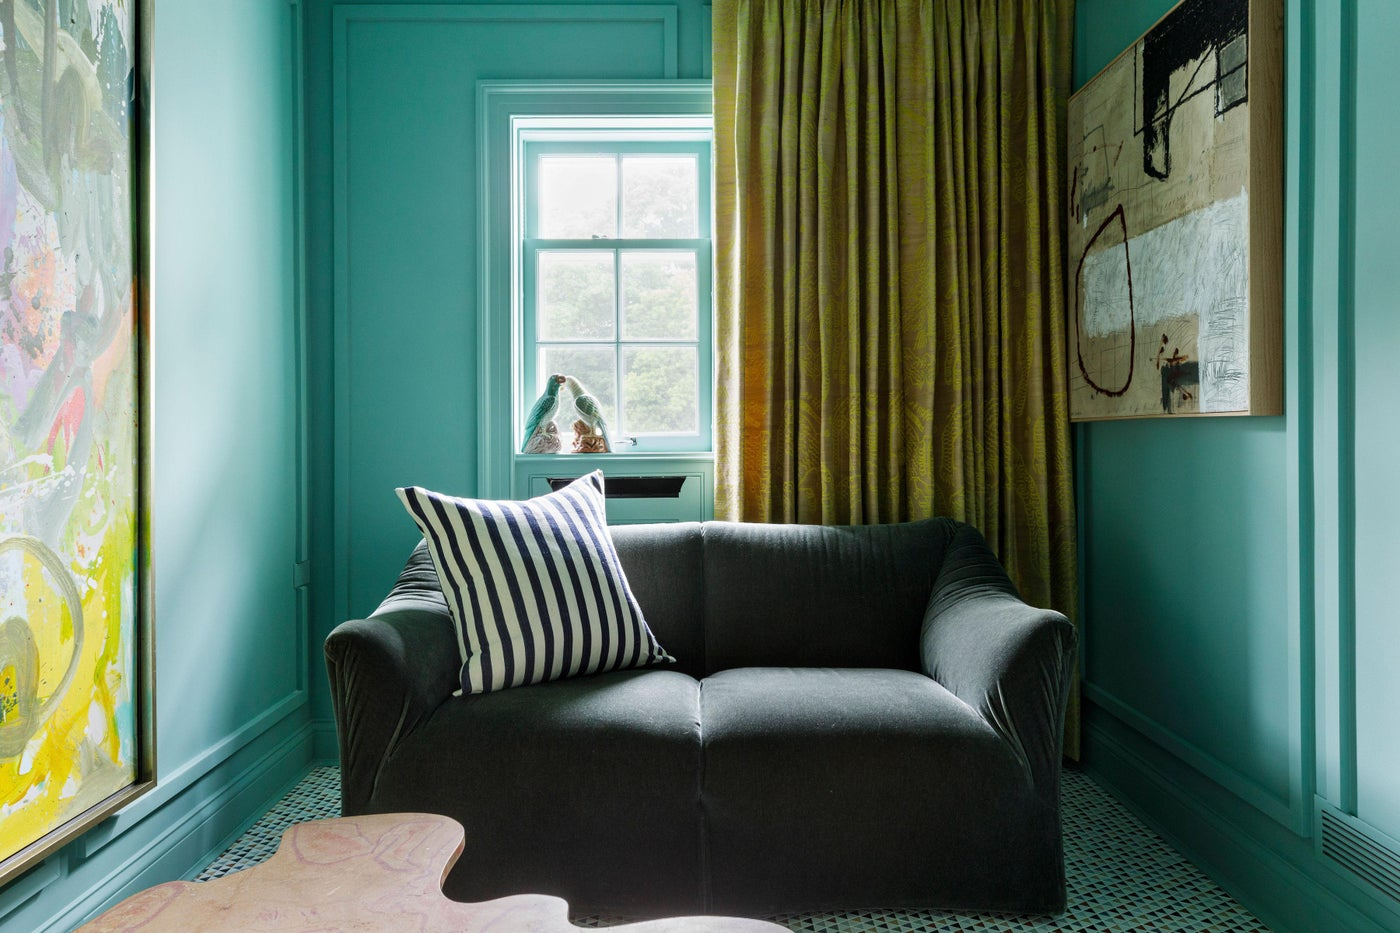 Lake Forest Showhouse 2020 : Marble Mosaic Floor, Mario Bellini Lovdseat, Stripe Pillow, Dedar Silk Drapery, Abstract Art, Green Walls